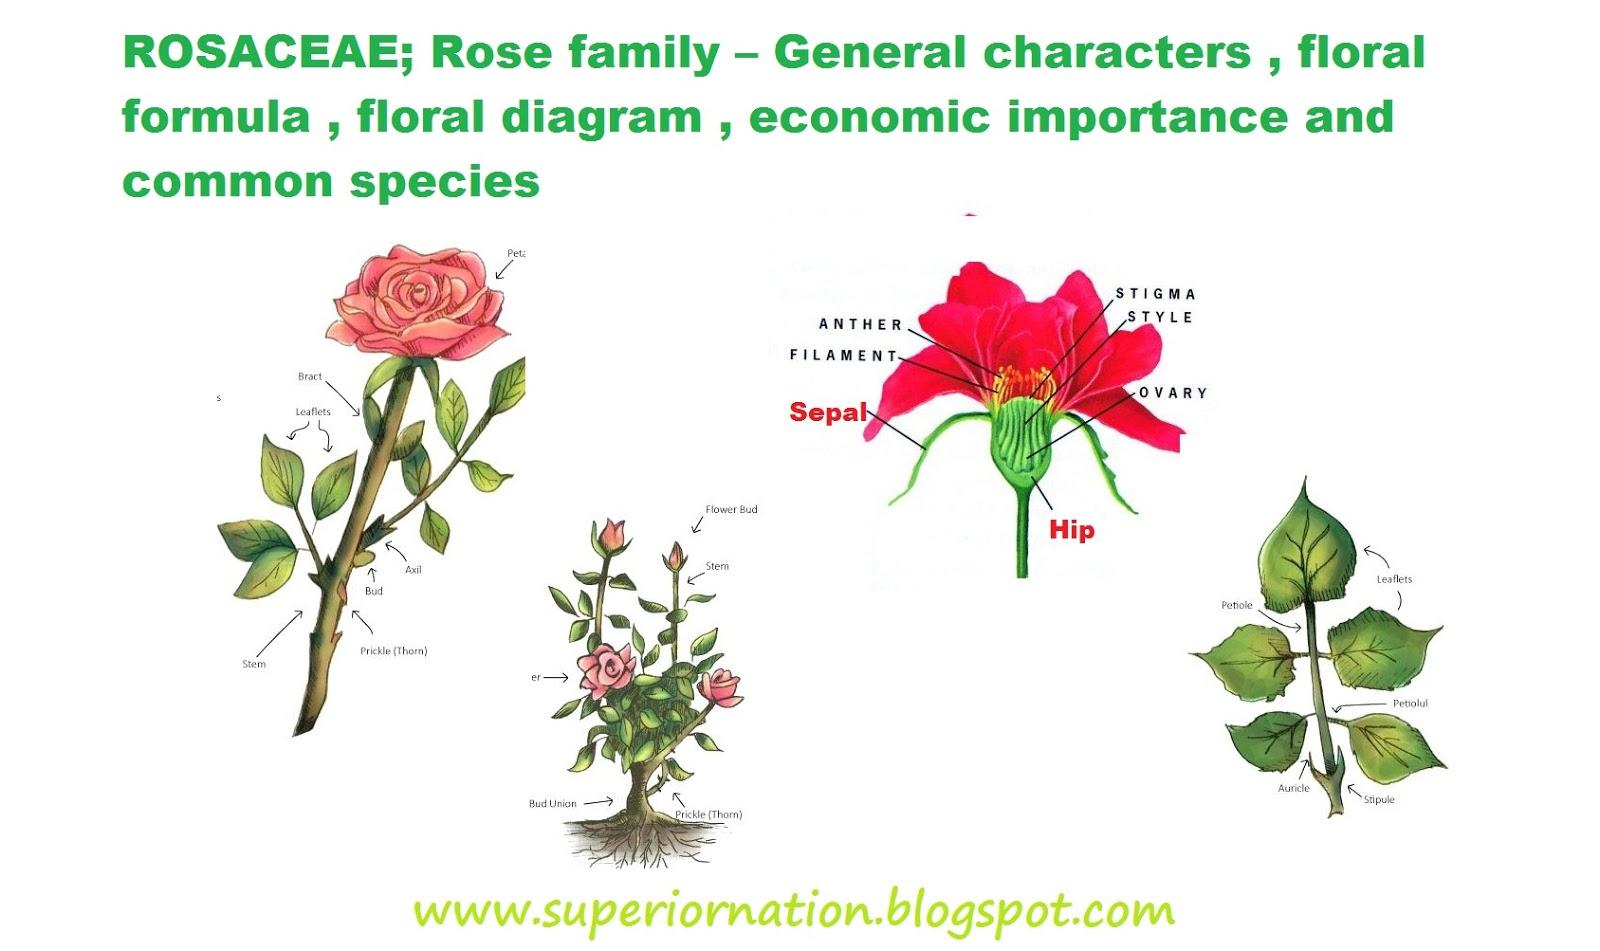 medium resolution of rosaceae rose family general characters floral formula floral diagram economic importance